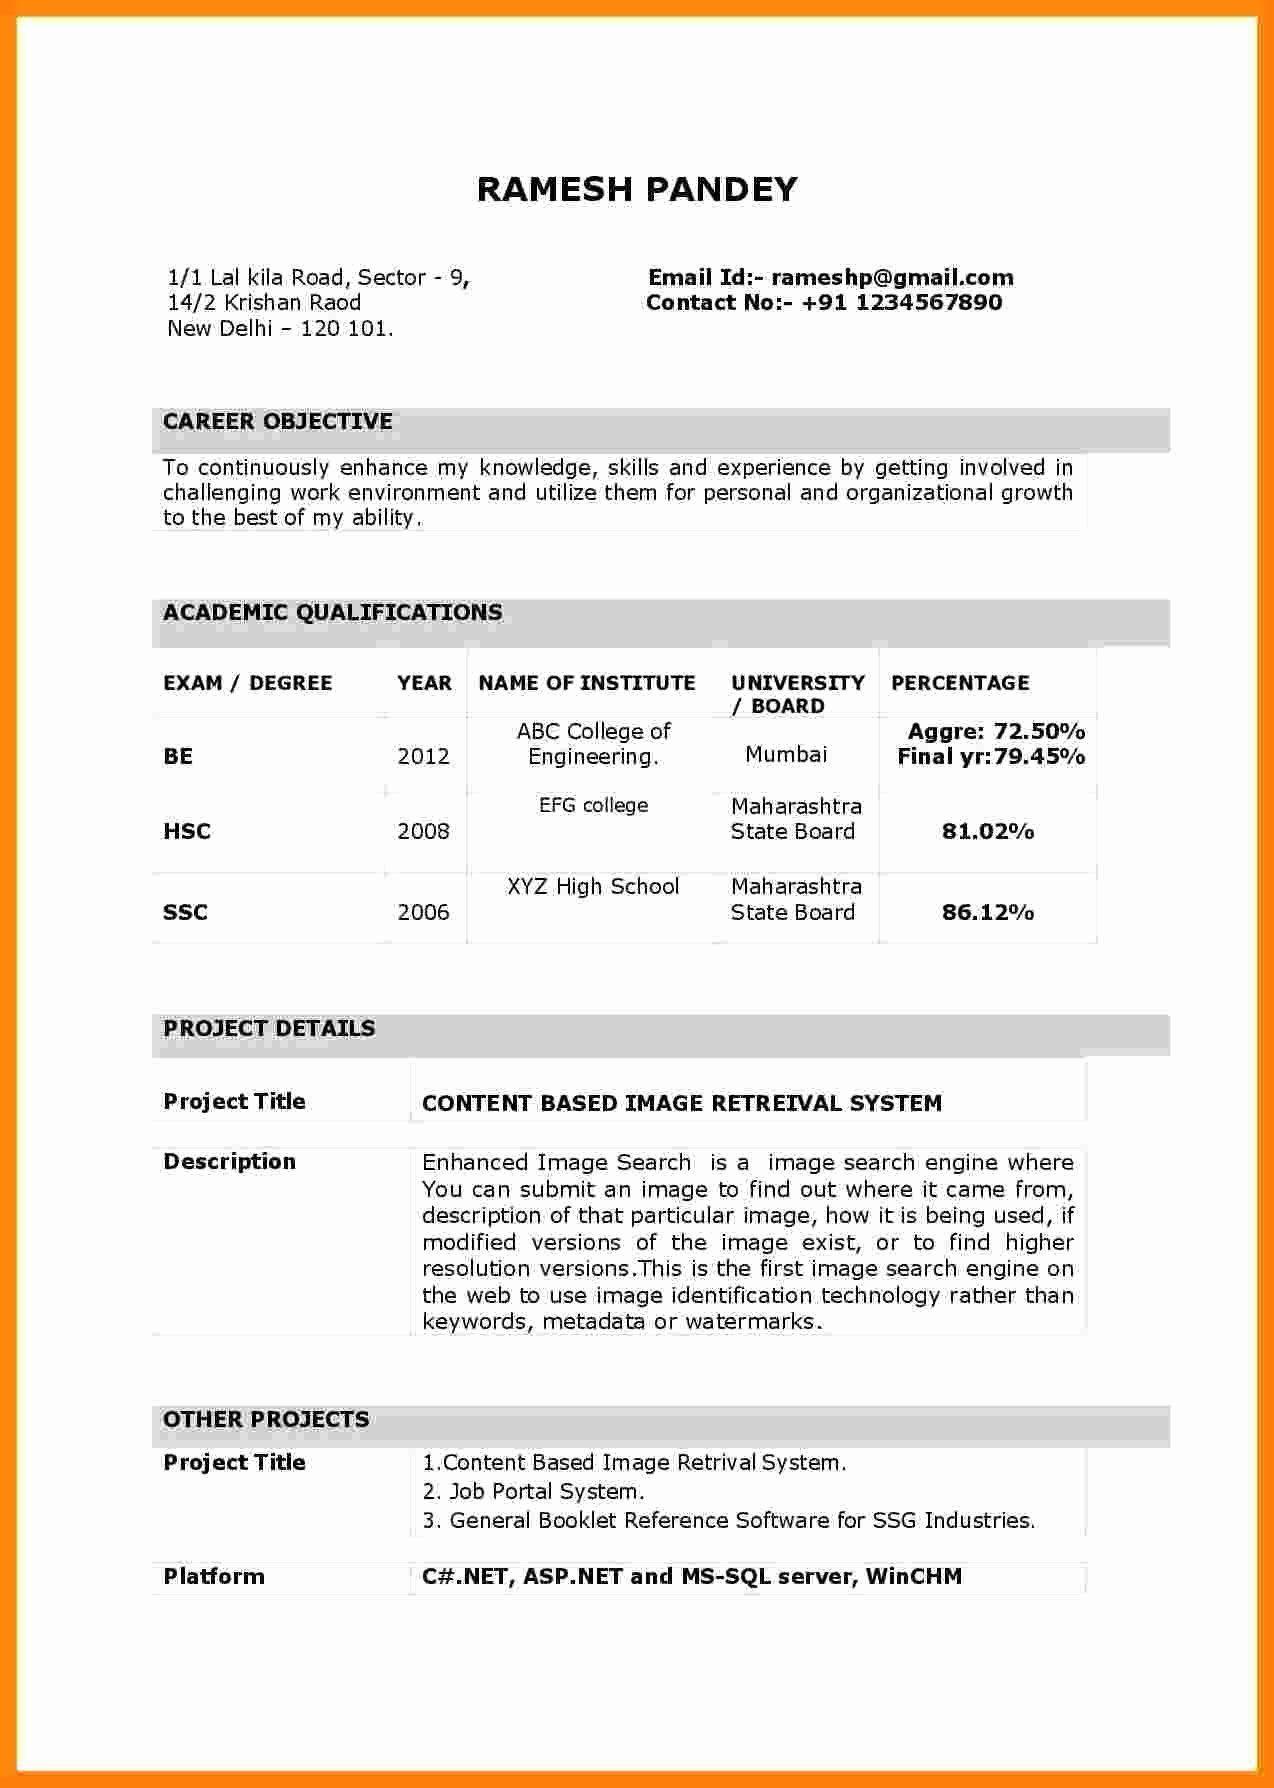 17 Automobile Fresher Resume Format Resume Format For Freshers Simple Resume Format Simple Resume